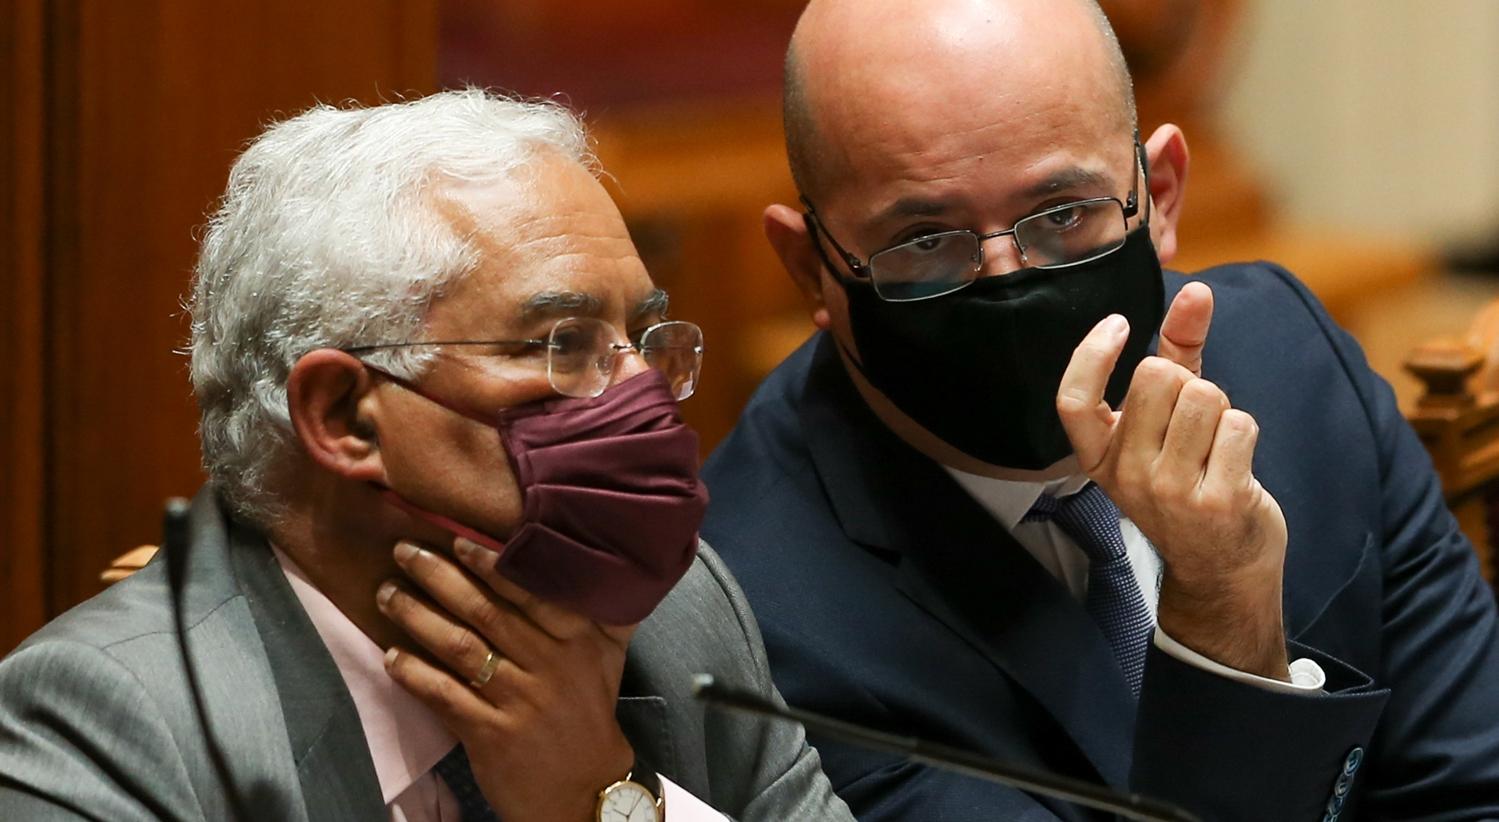 Novo Banco. Costa promete cumprir contrato, Rio insiste em auditoria